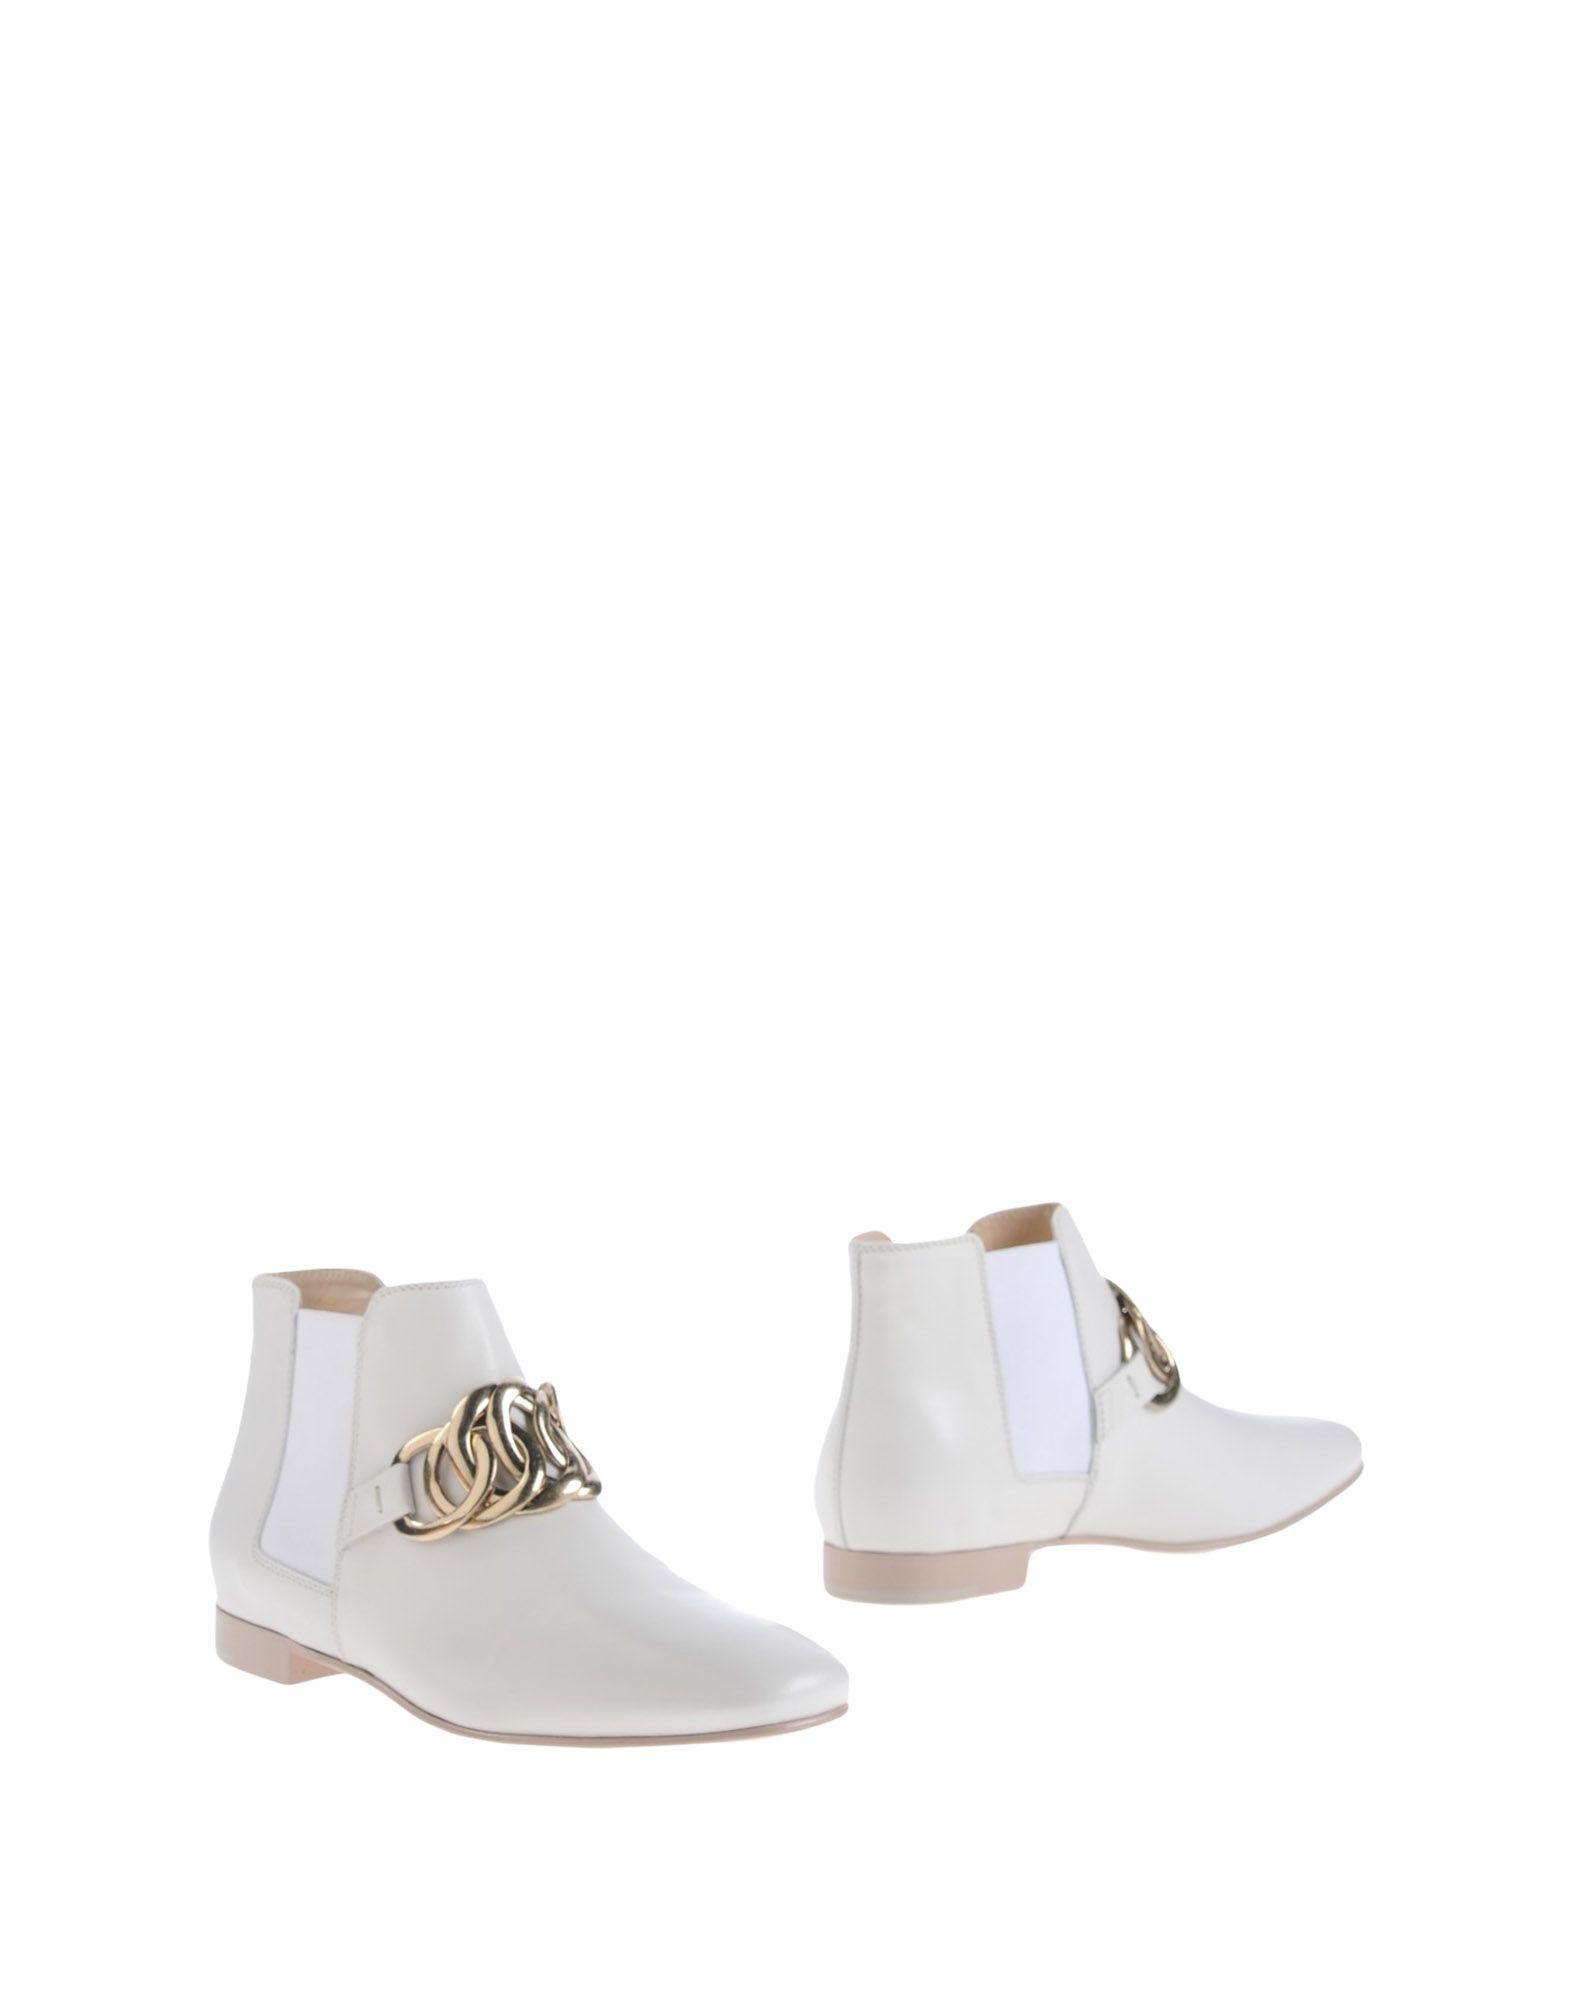 Stilvolle Stilvolle Stilvolle billige Schuhe Tod's Chelsea Boots Damen  11337022RT 6dd5bd